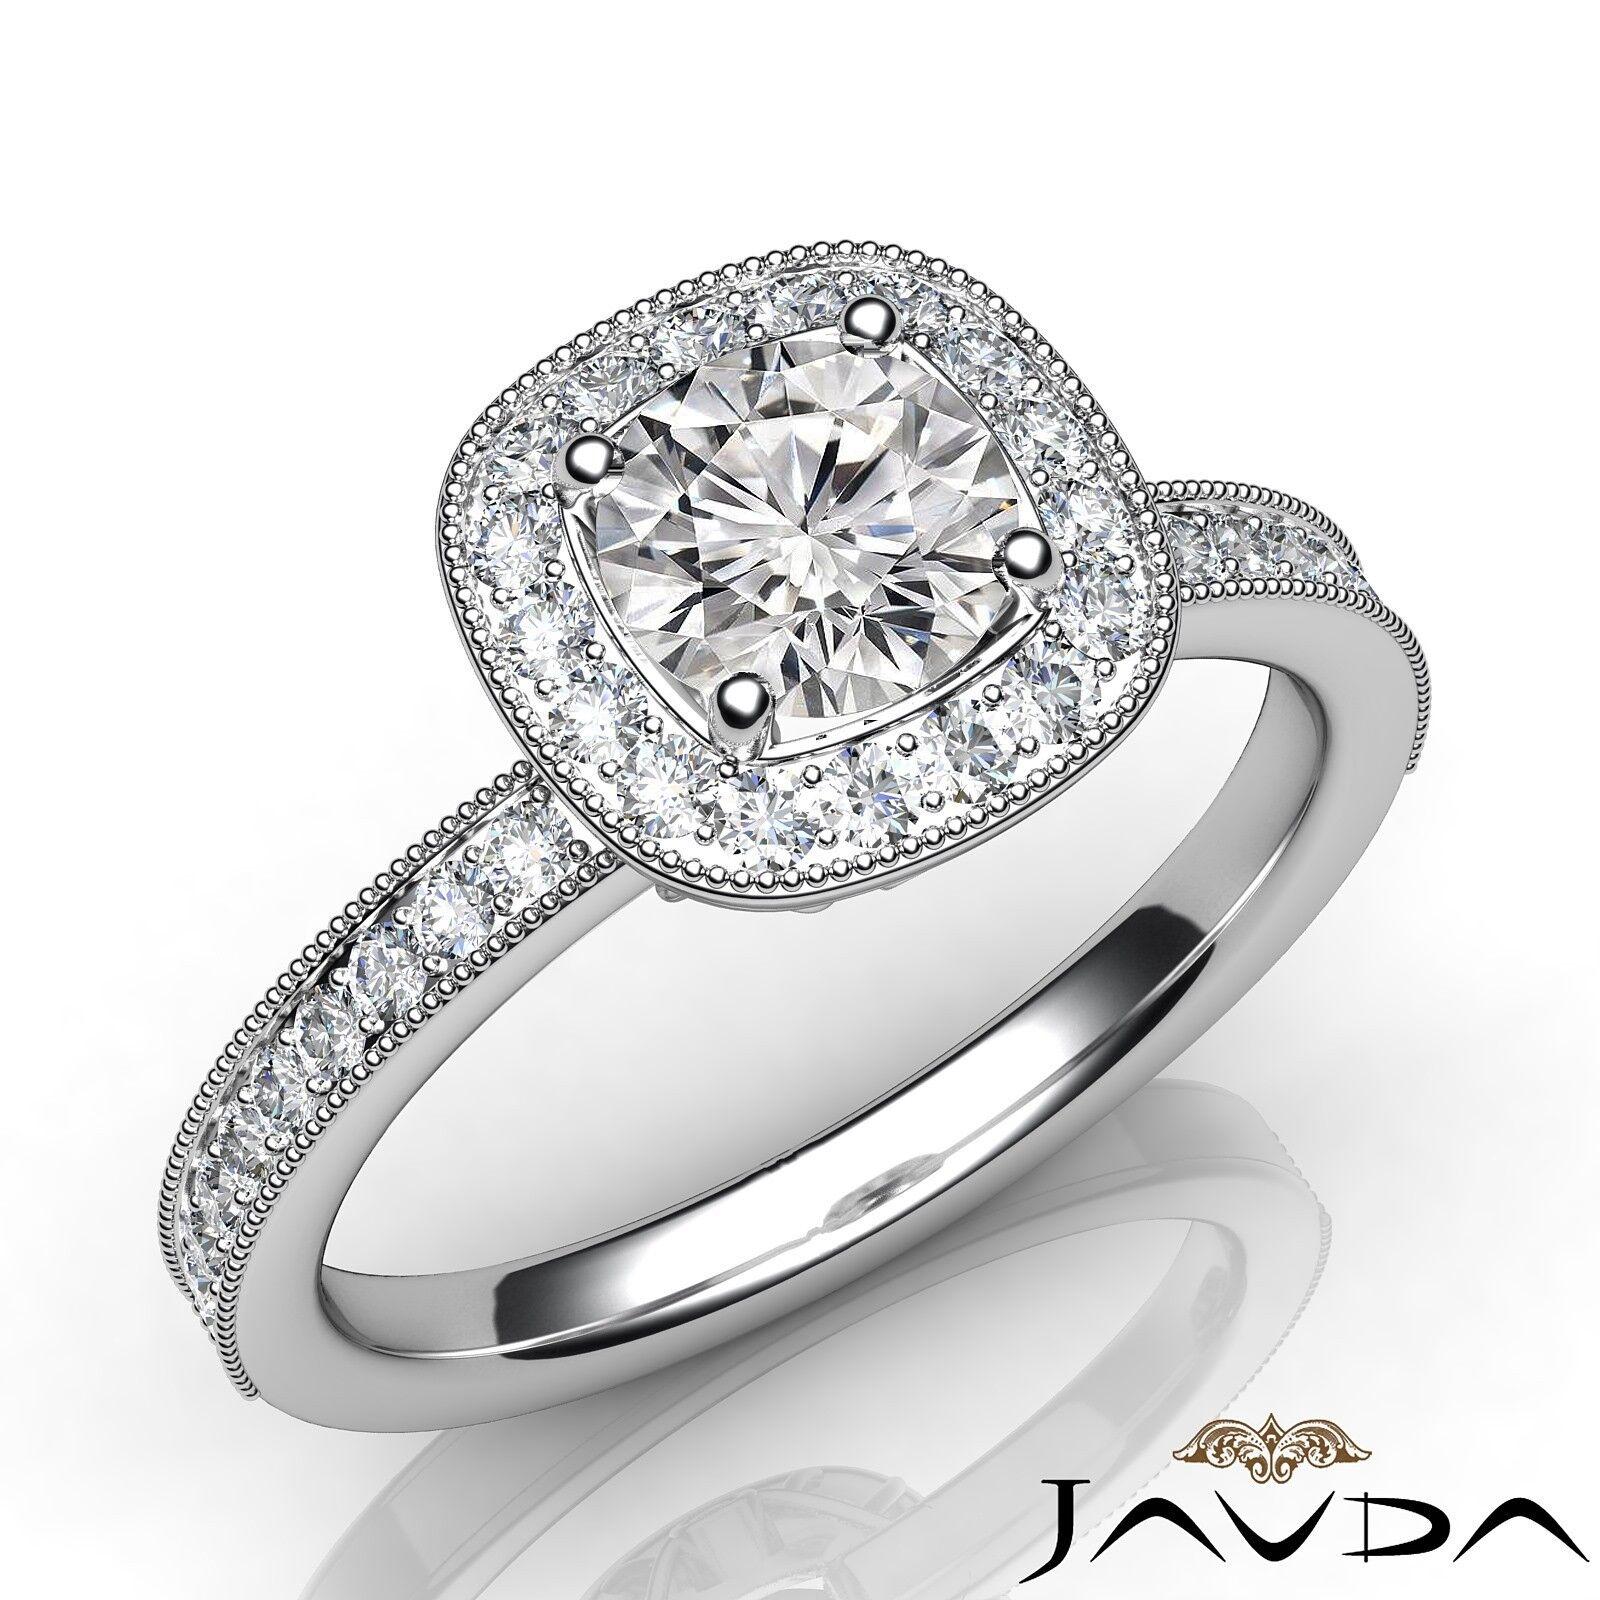 1.2ctw Bridge Accent Round Diamond Engagement Ring GIA E-VVS1 White Gold Rings